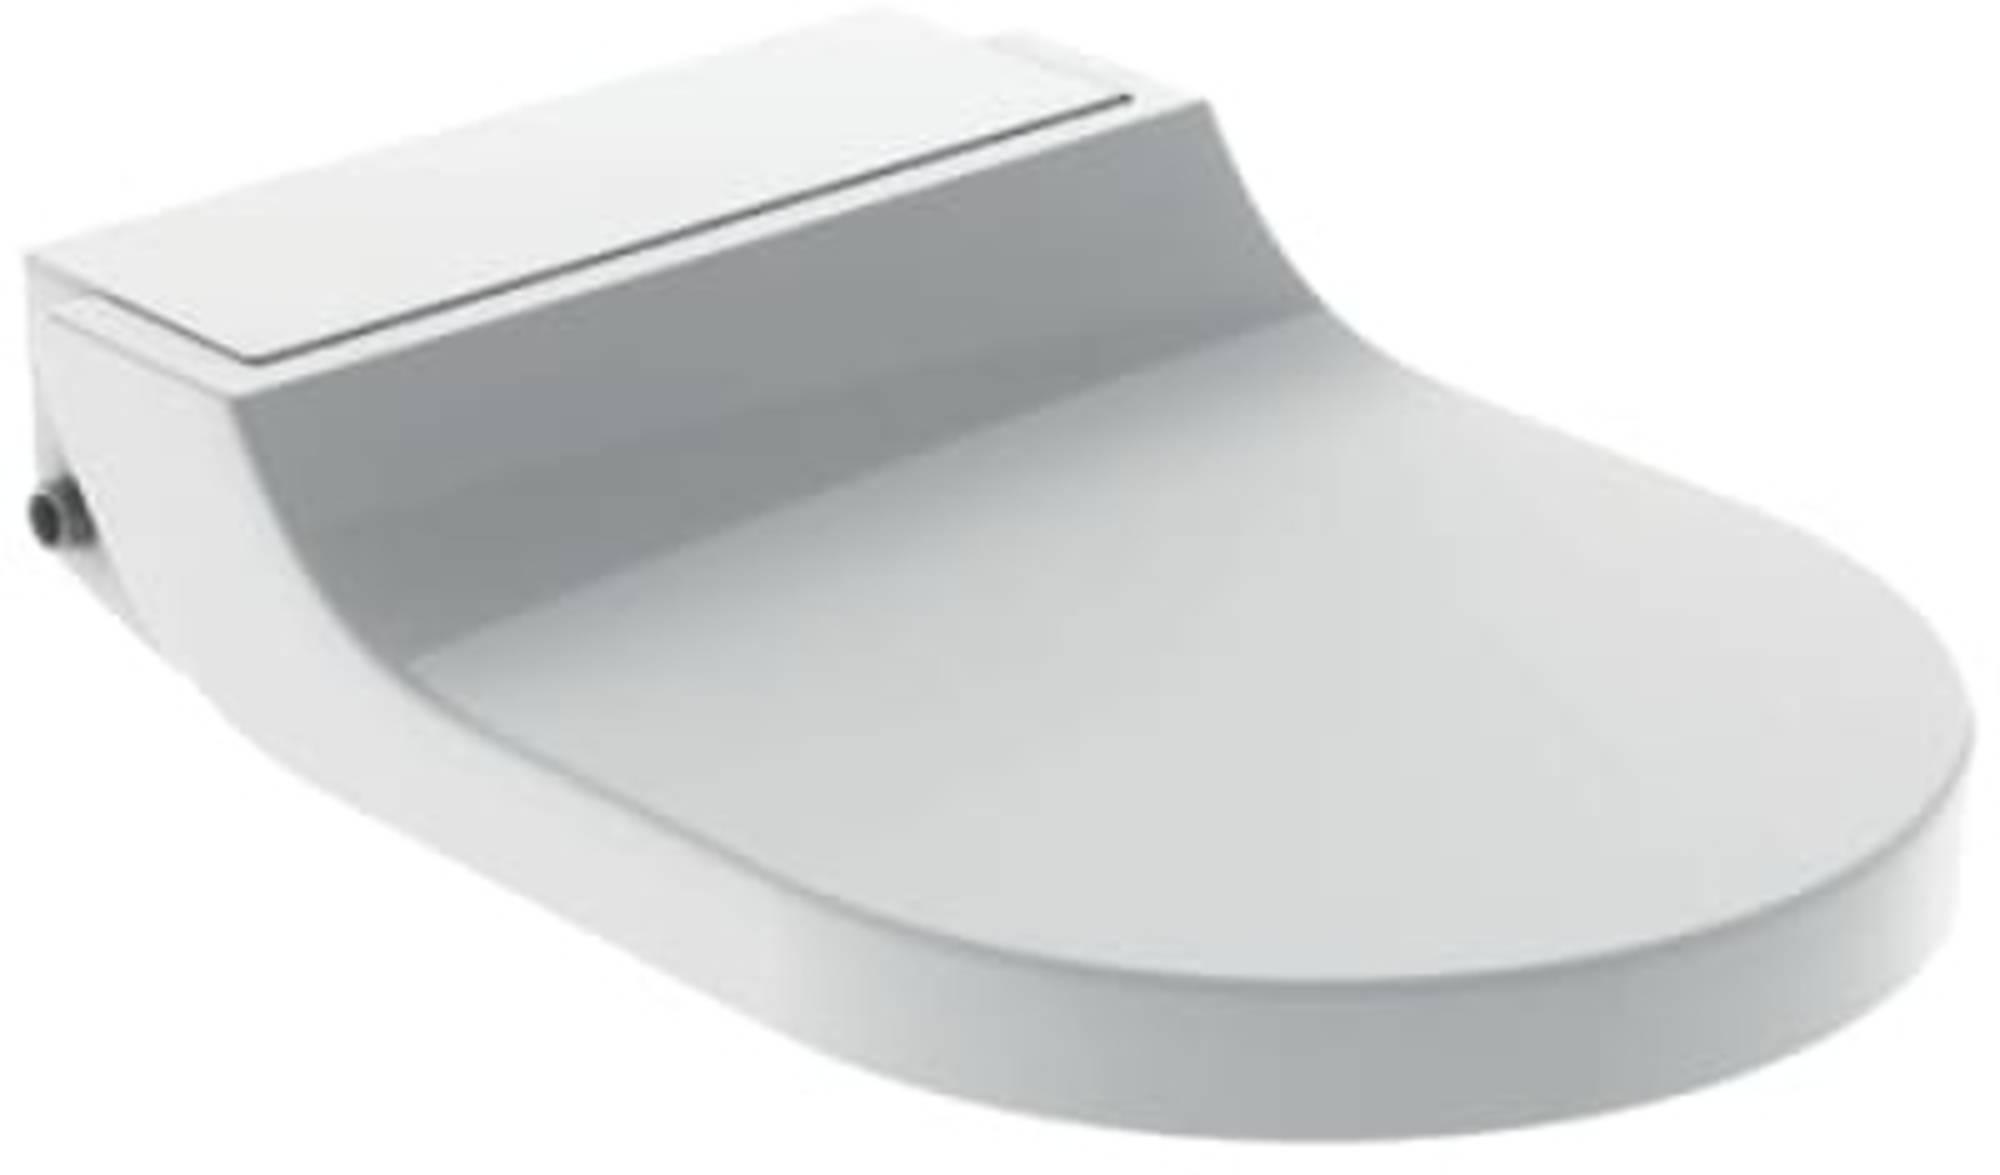 Productafbeelding van Geberit Aquaclean Tuma Classic Closetzitting voor Douche WC Wit